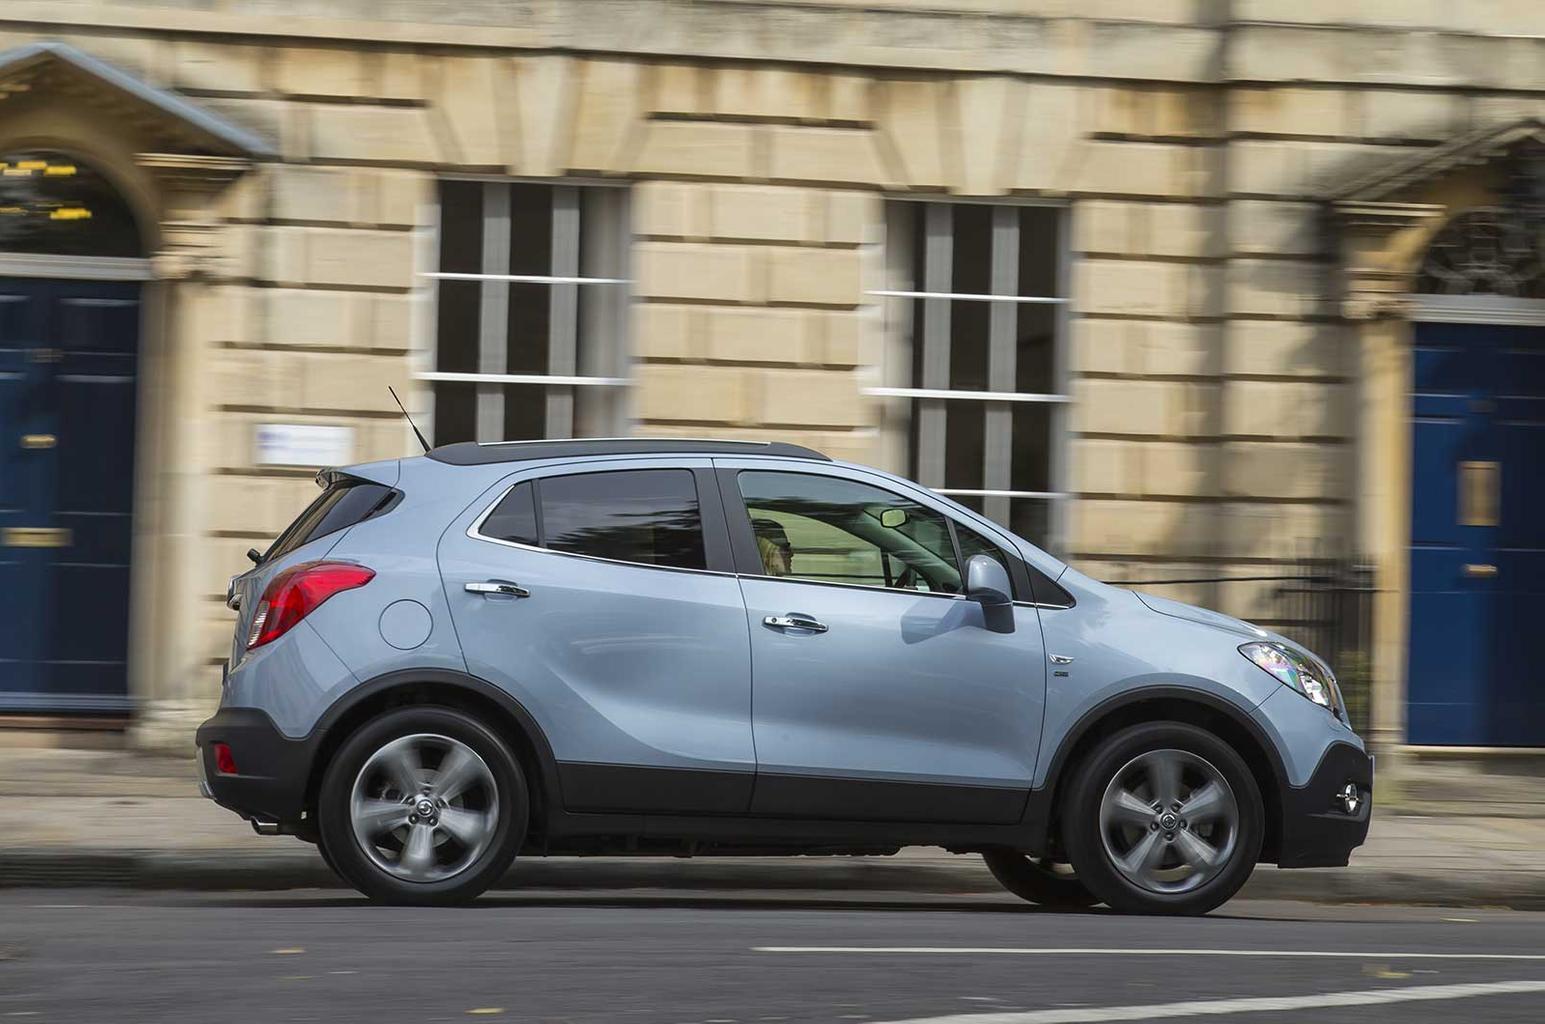 Used car of the week: Vauxhall Mokka